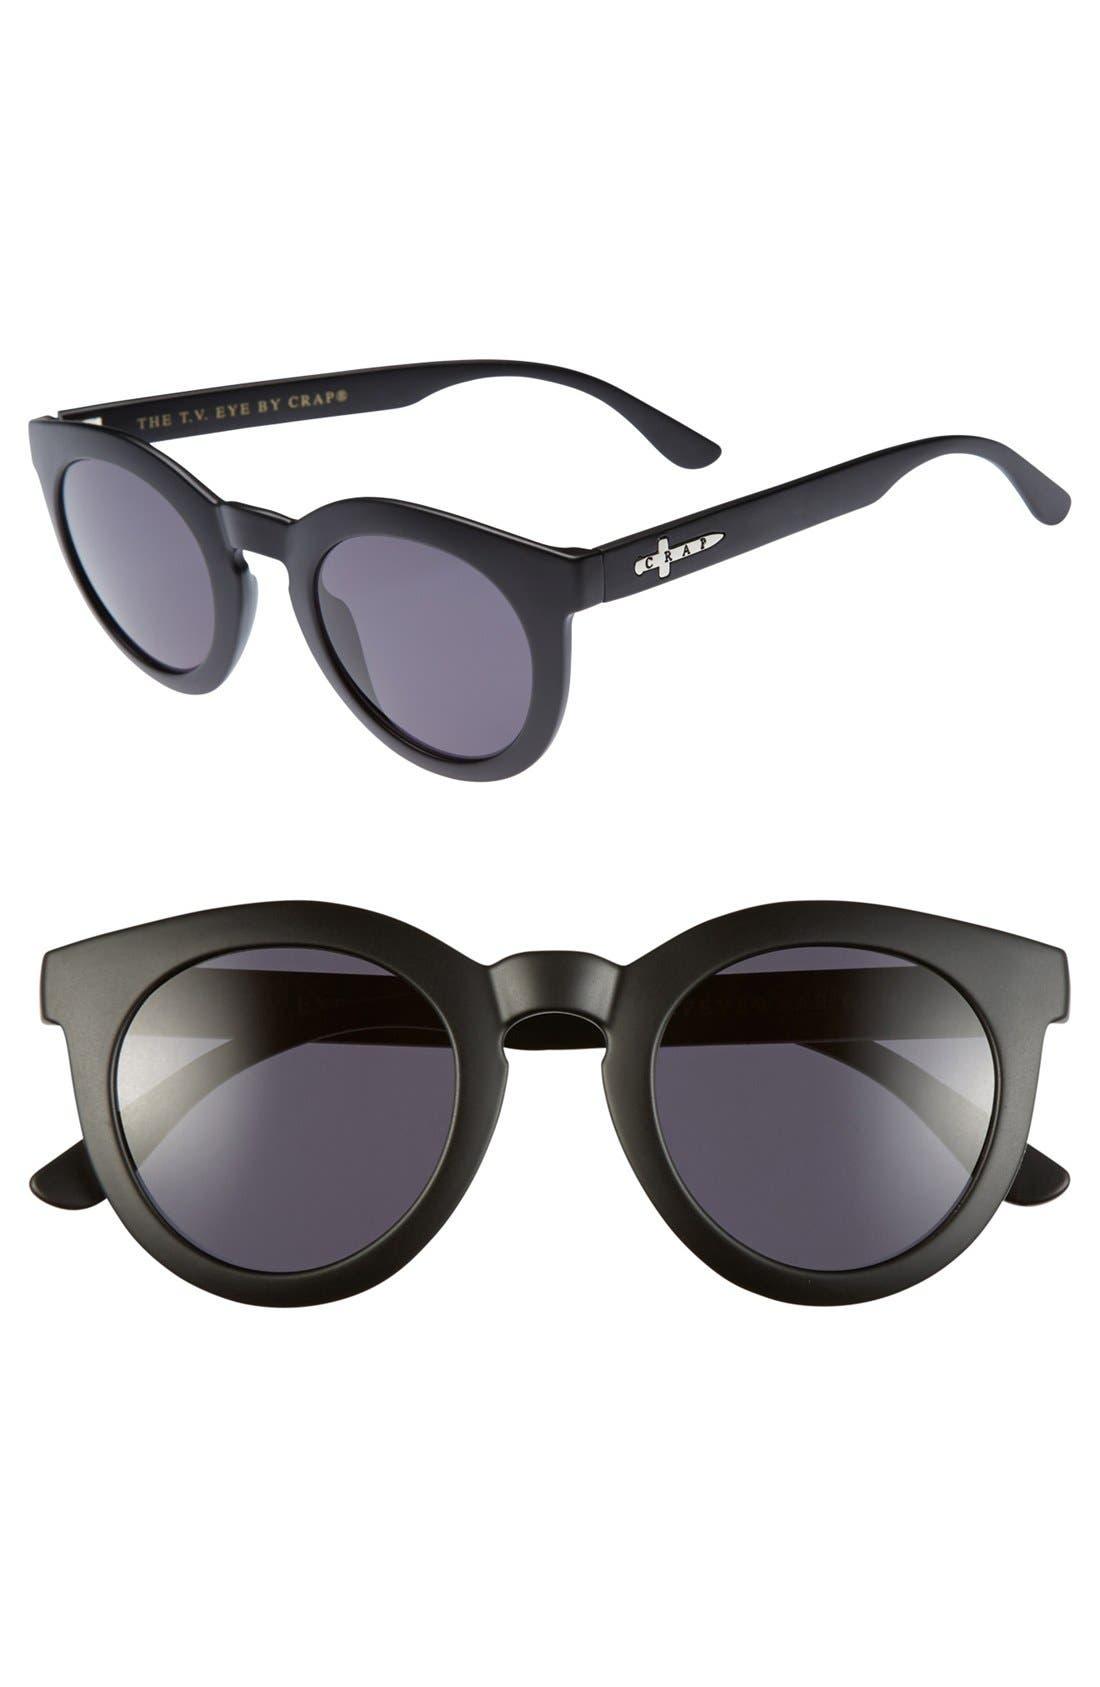 'The T.V. Eye' 55mm Sunglasses,                             Main thumbnail 1, color,                             001